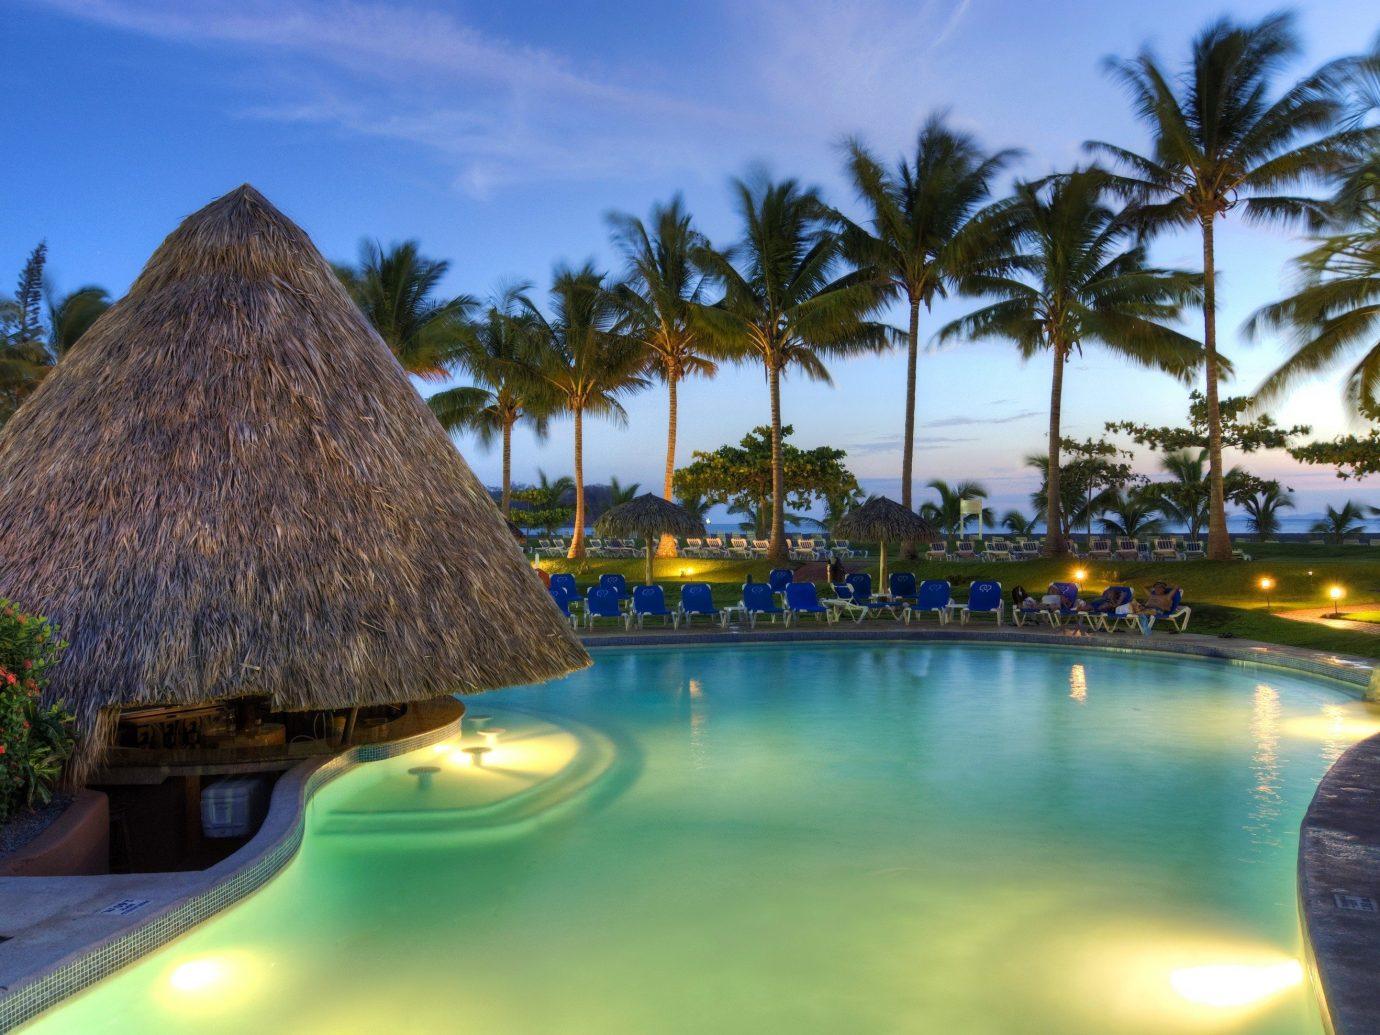 The pool at Fiesta Resort All Inclusive Costa Rica